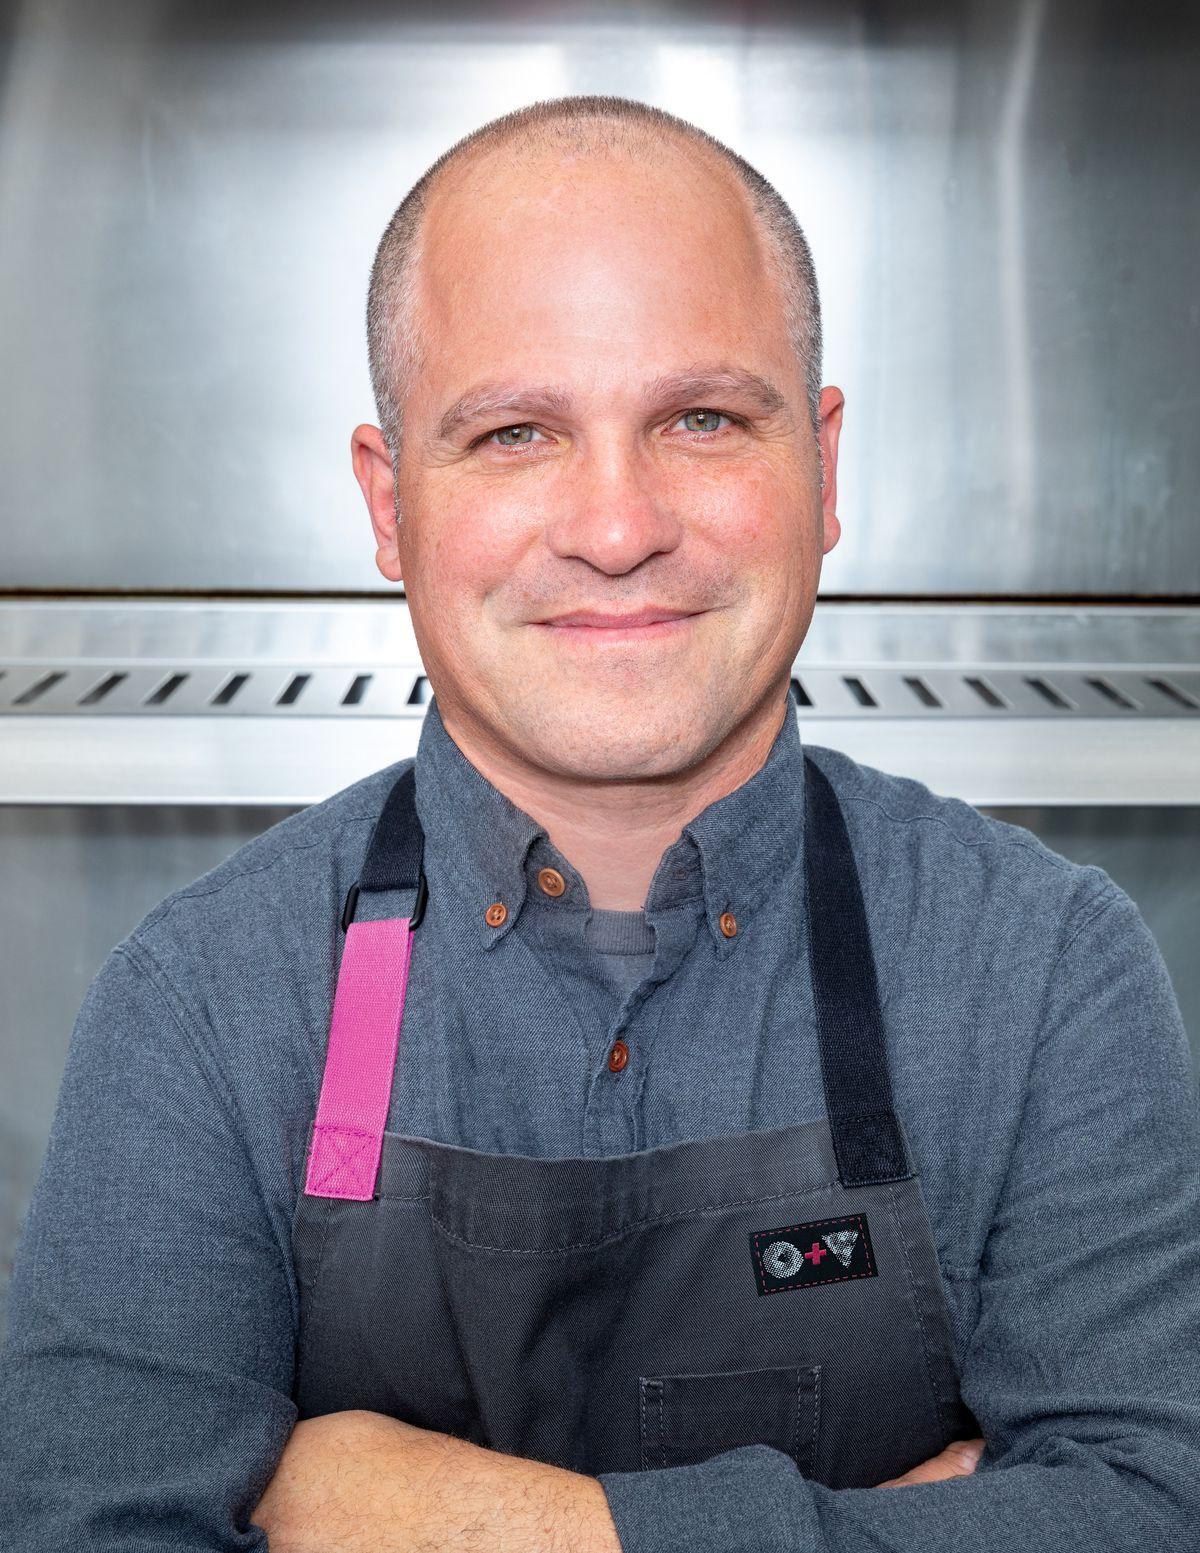 Chef Bradford Kent of Olio, Blaze, and Bagel and Slice.